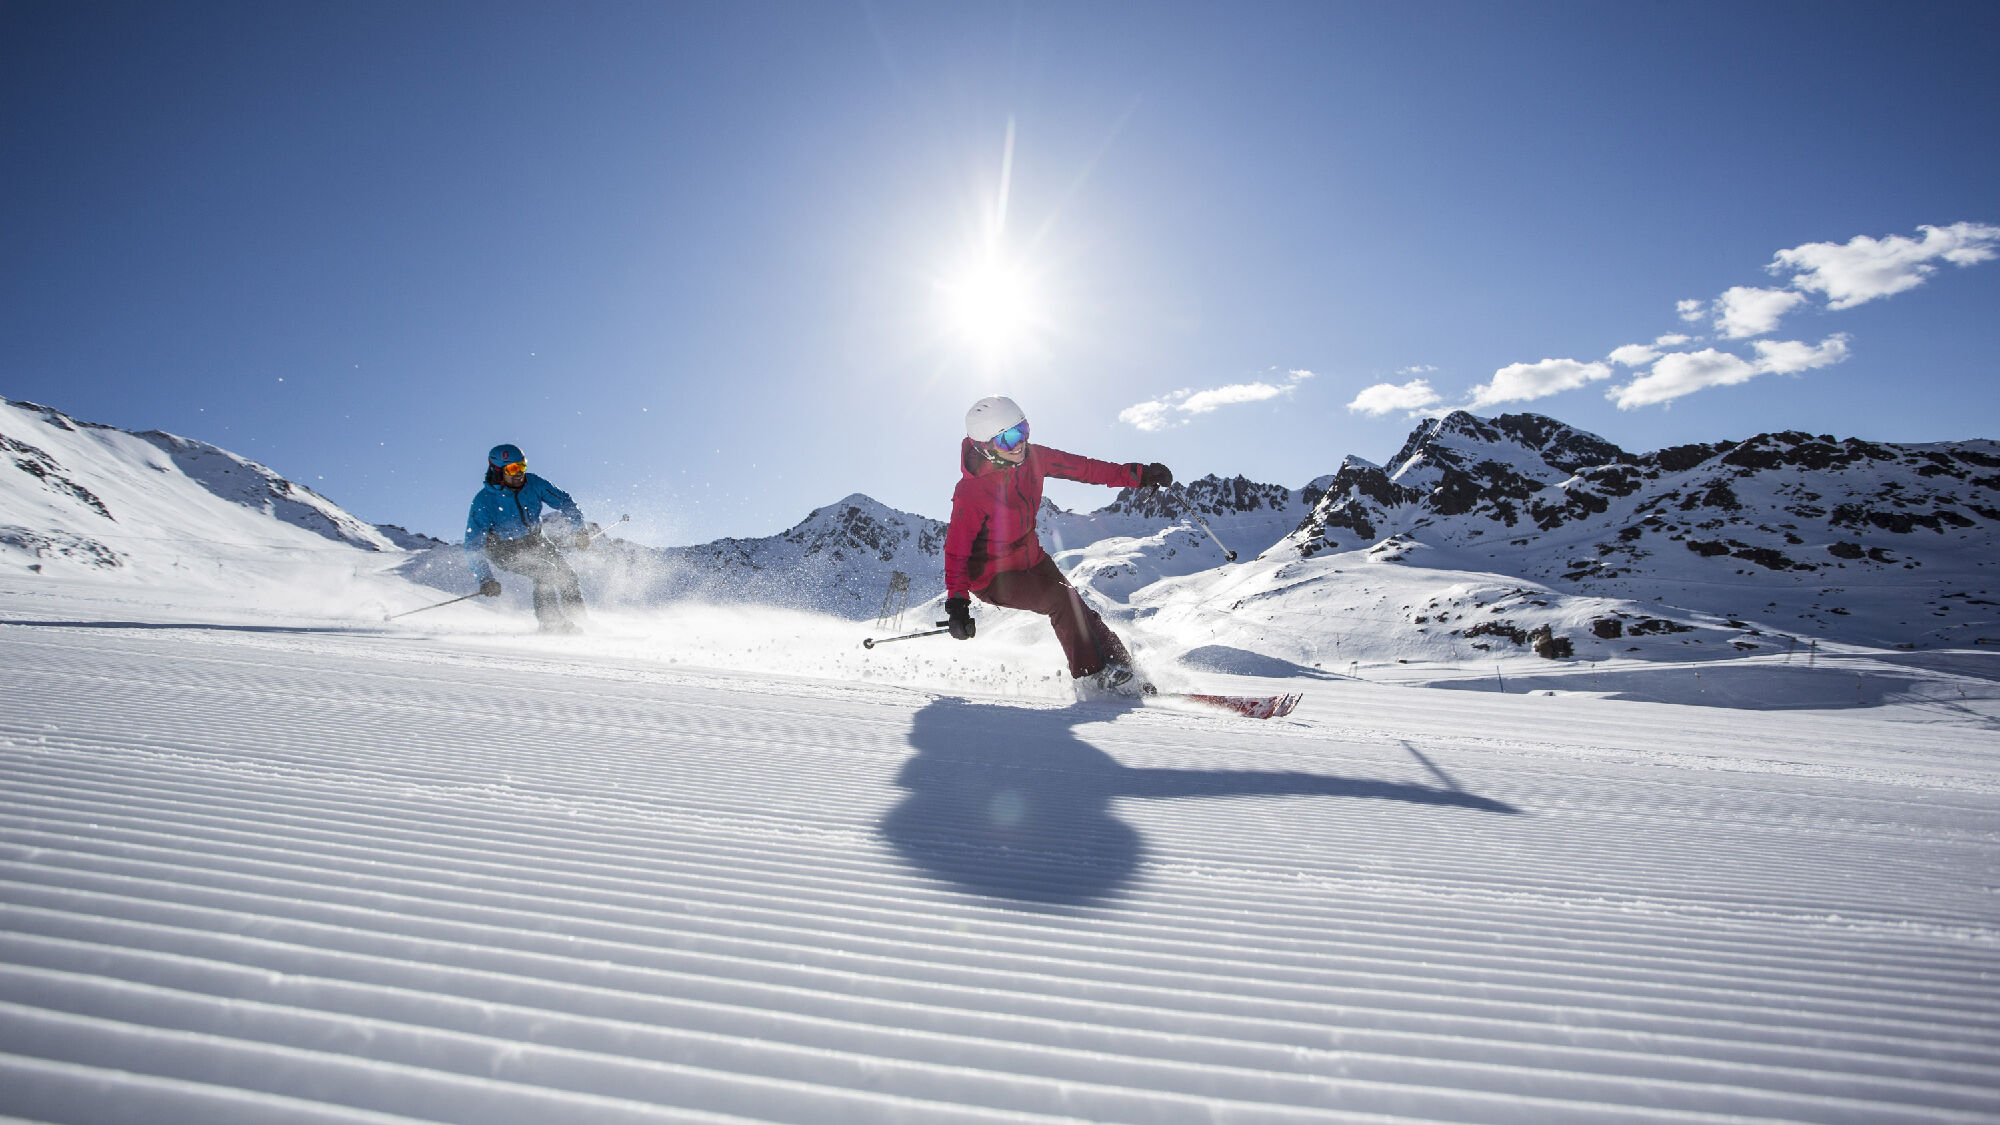 Erneuter Winterspaß am Kaunertaler Gletscher steht bevor